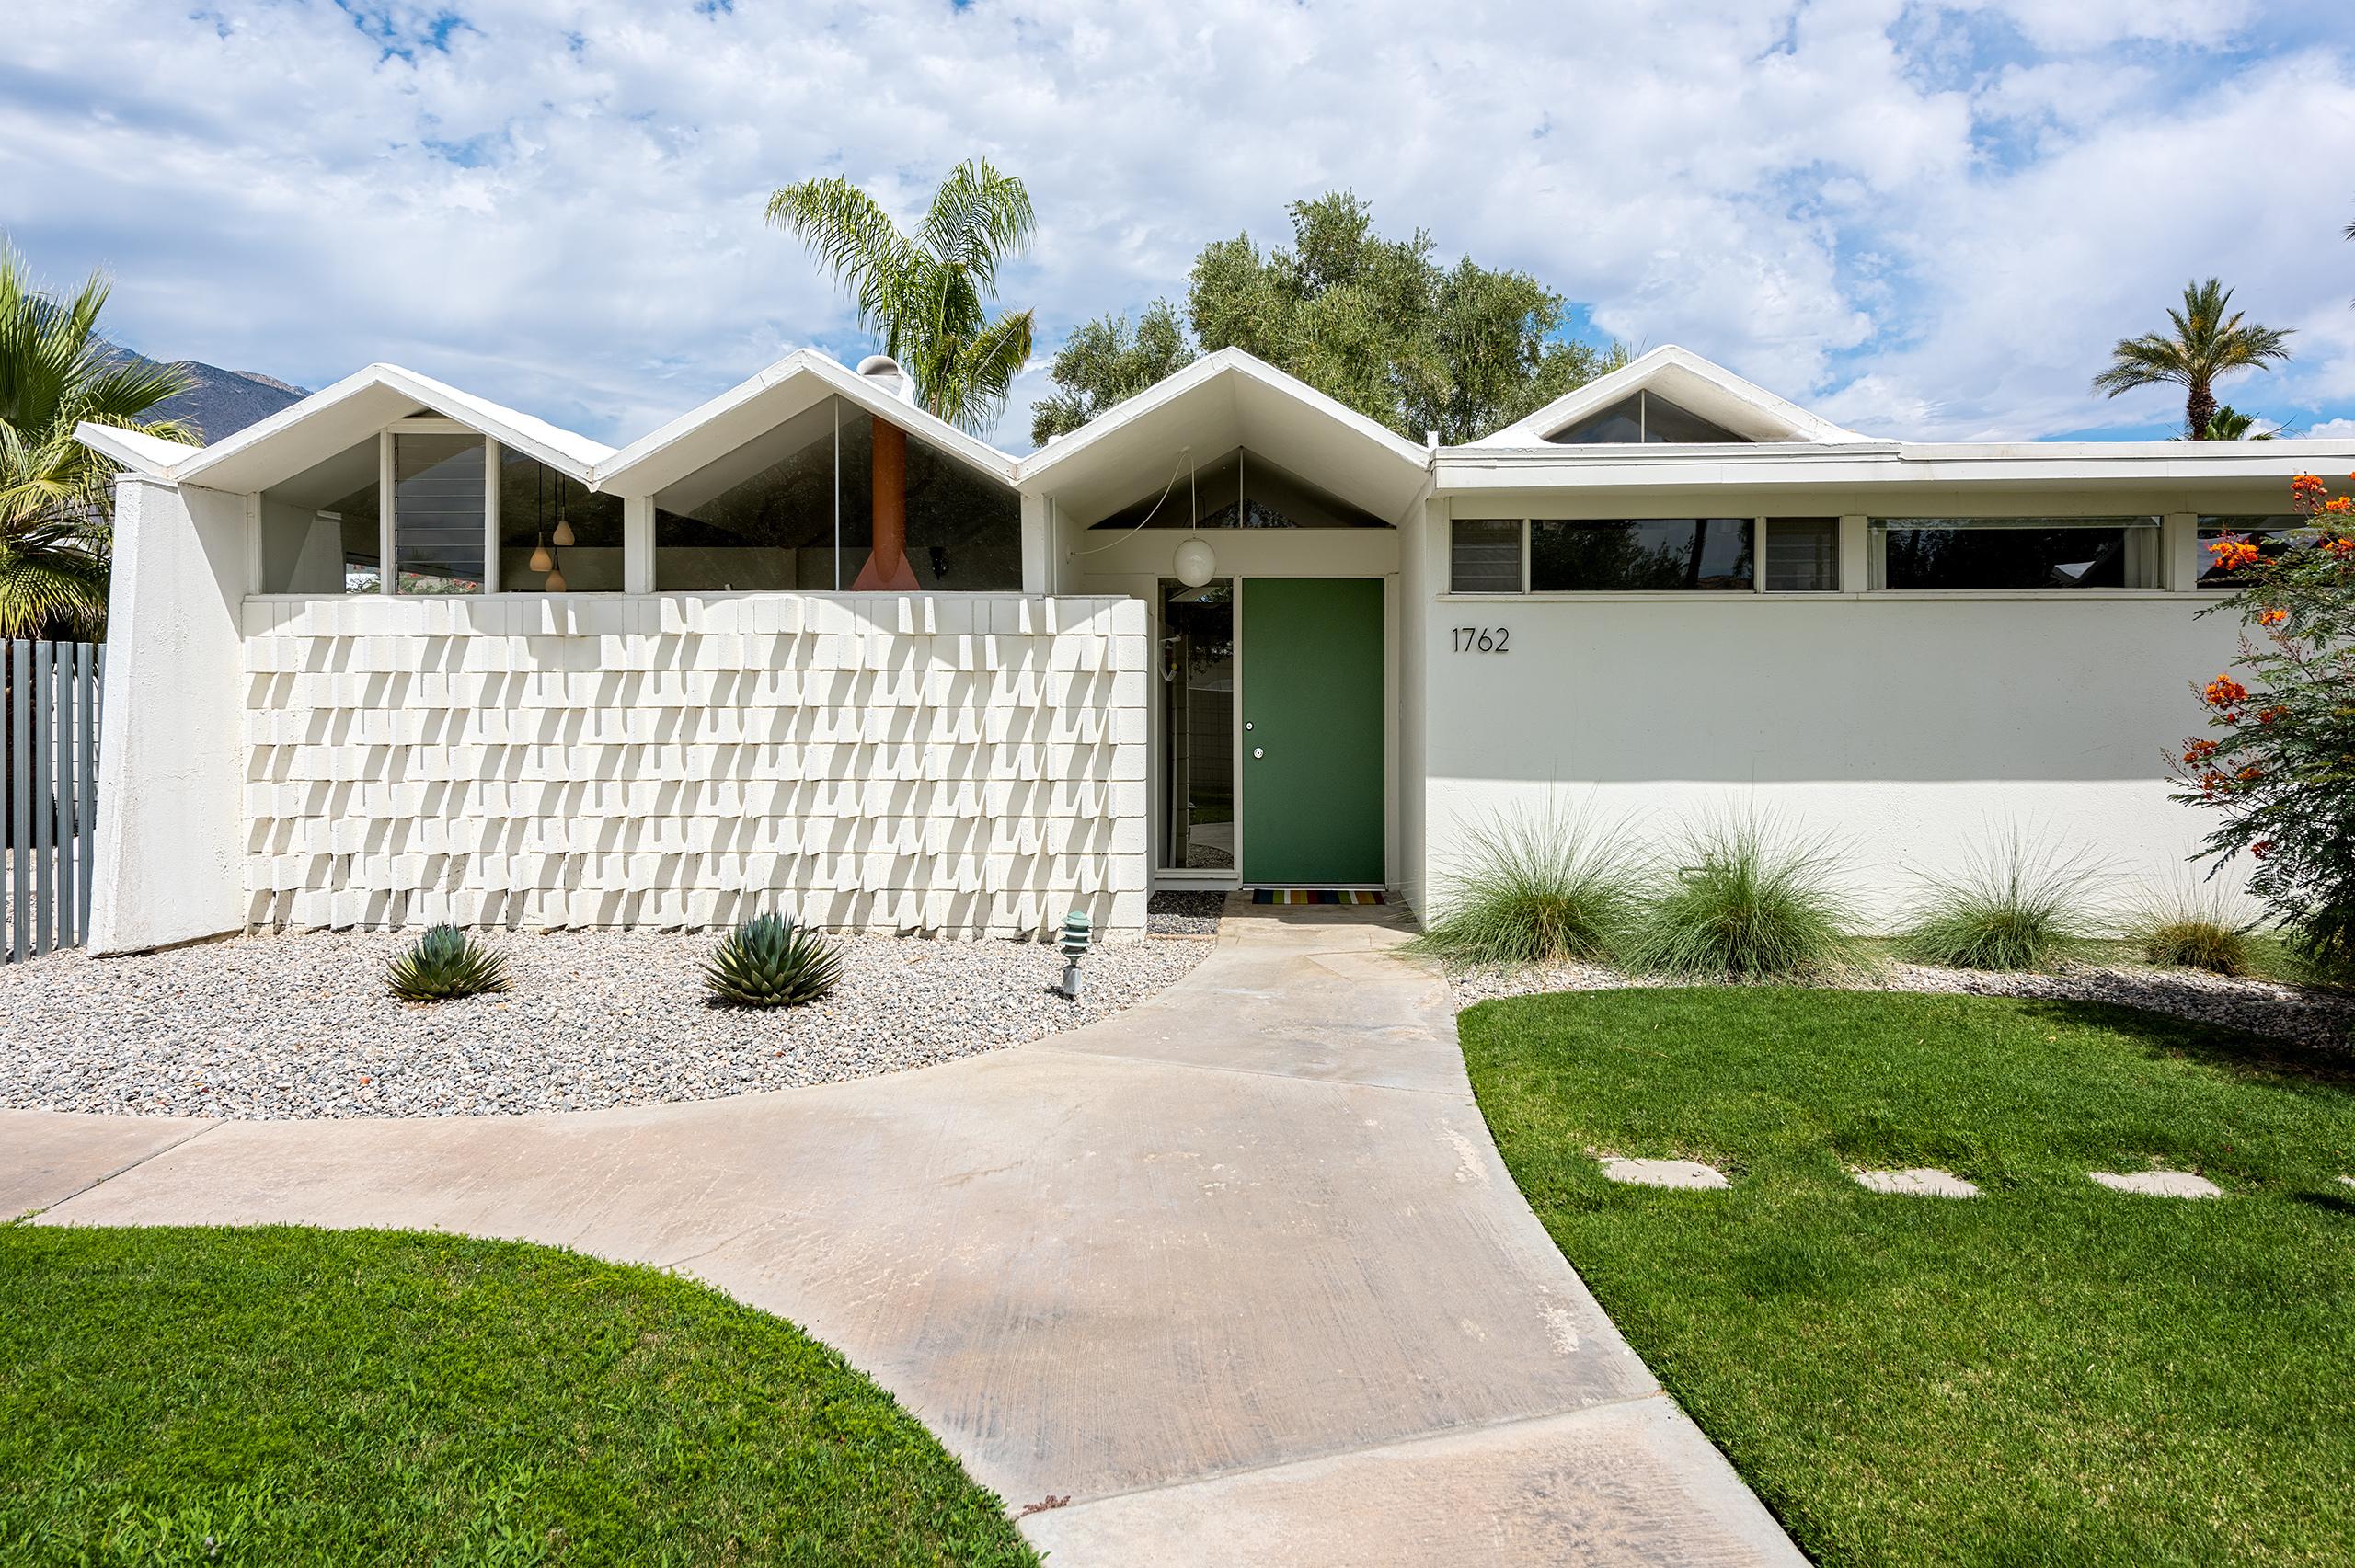 Modernist Palm Springs condo seeks $469K